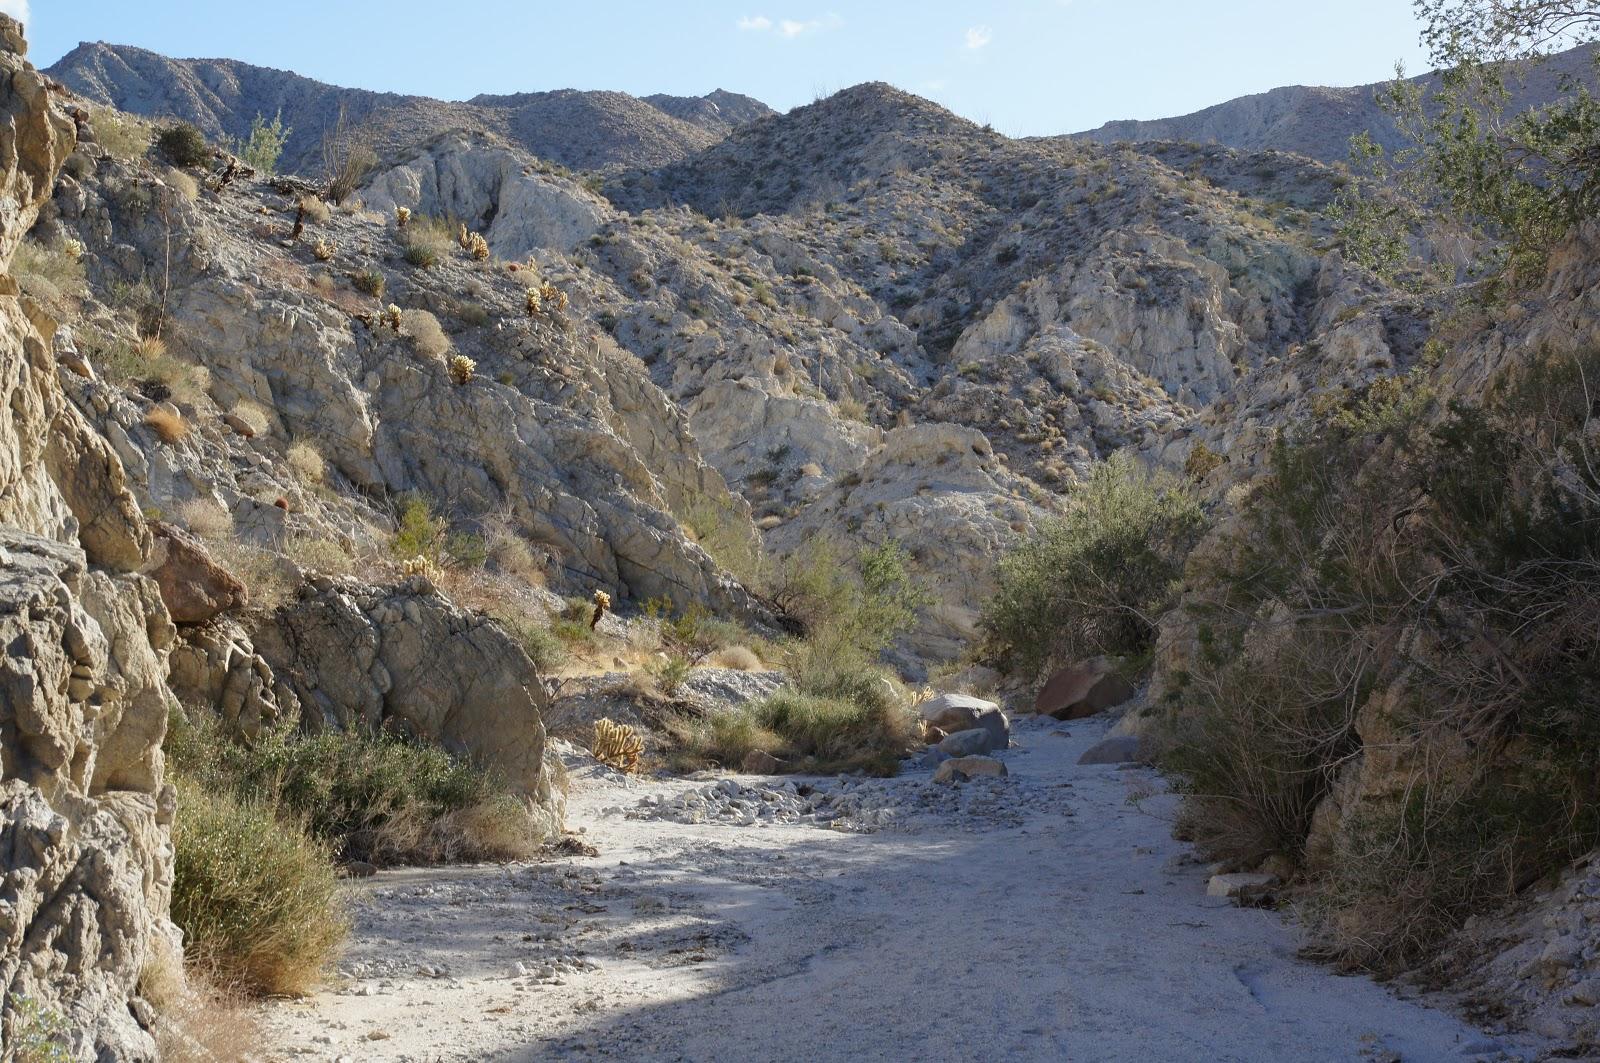 Mamma Quail Hiking California : An Unexpected Hike